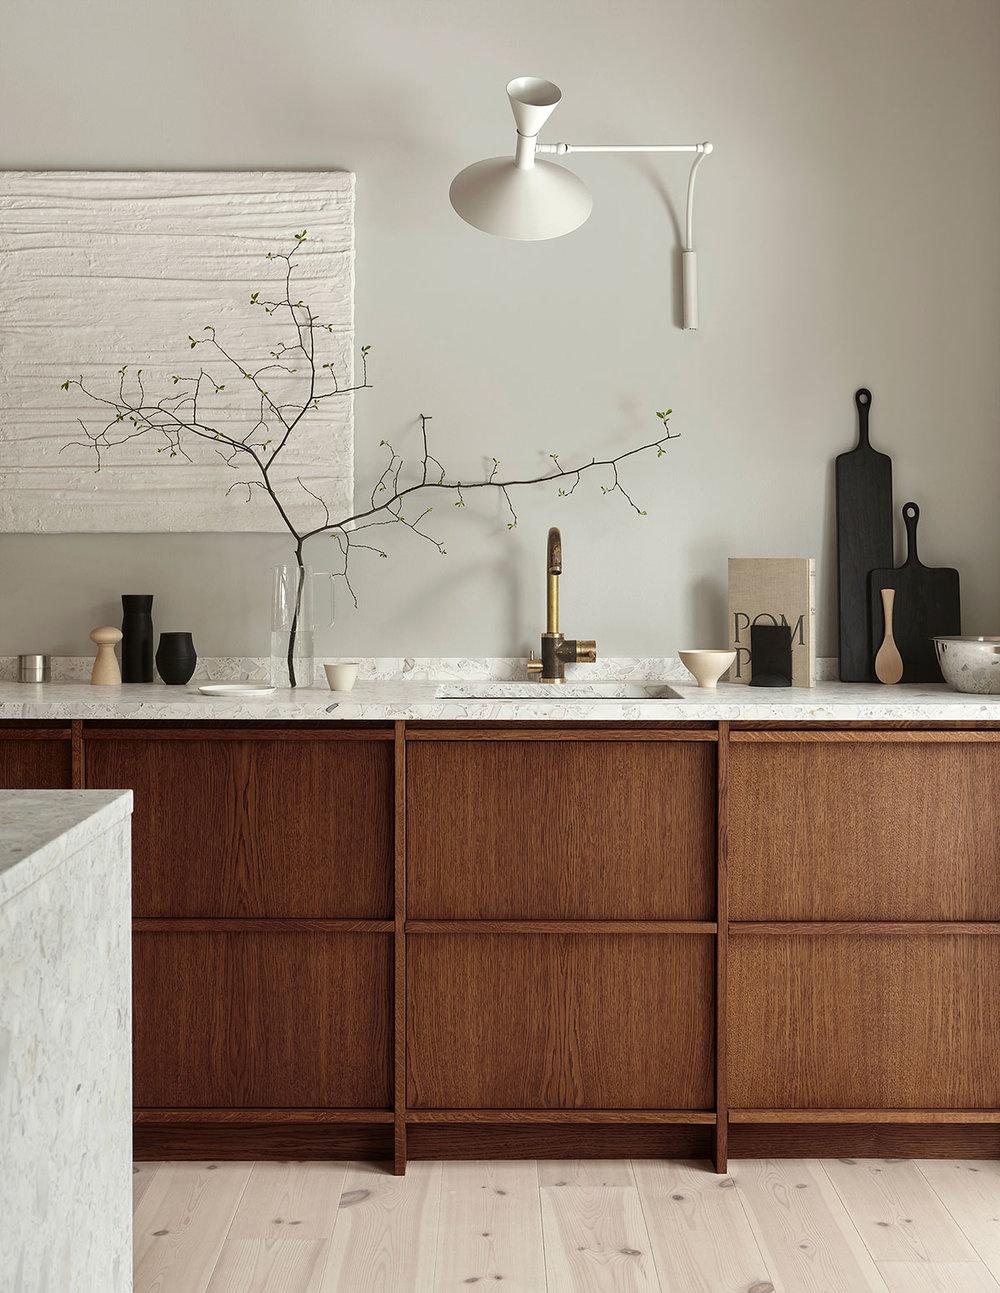 keukentrends 2021 houten keuken